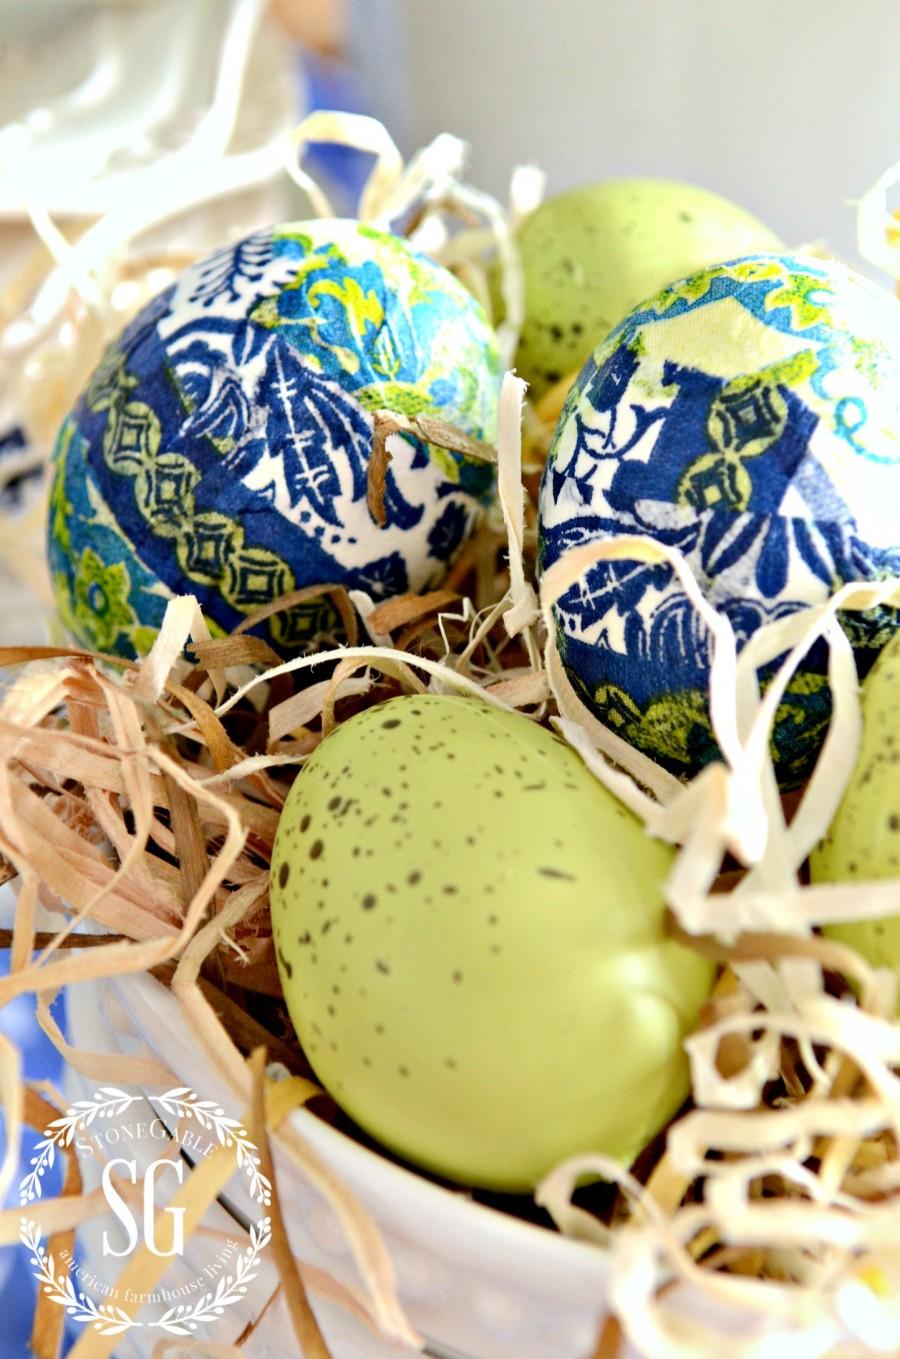 SPRING KITCHEN TABLE VIGNETTE-blue and green tissue covered eggs-close up-stonegableblog.com